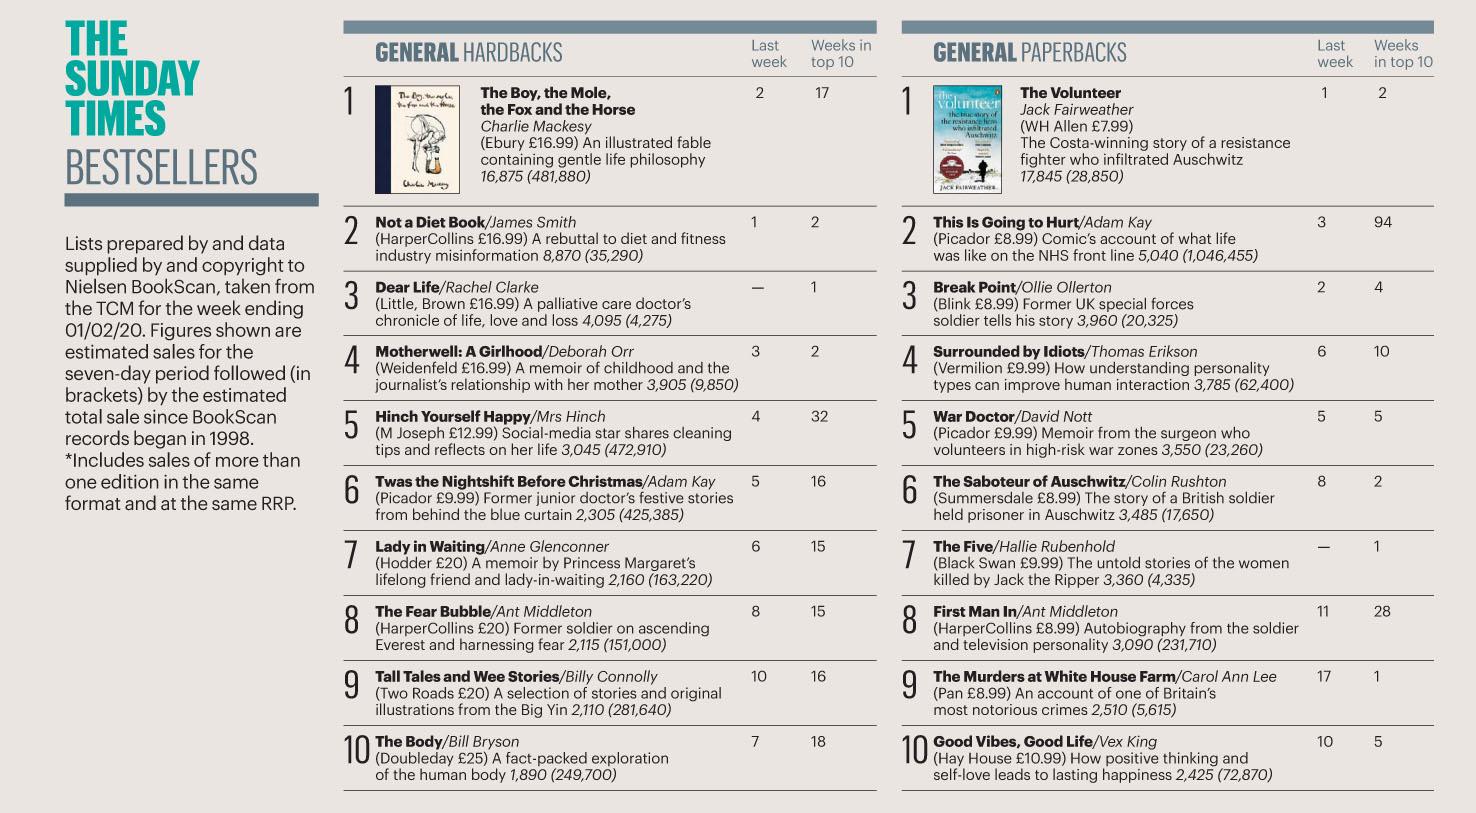 Times 200209 Books 01.jpg